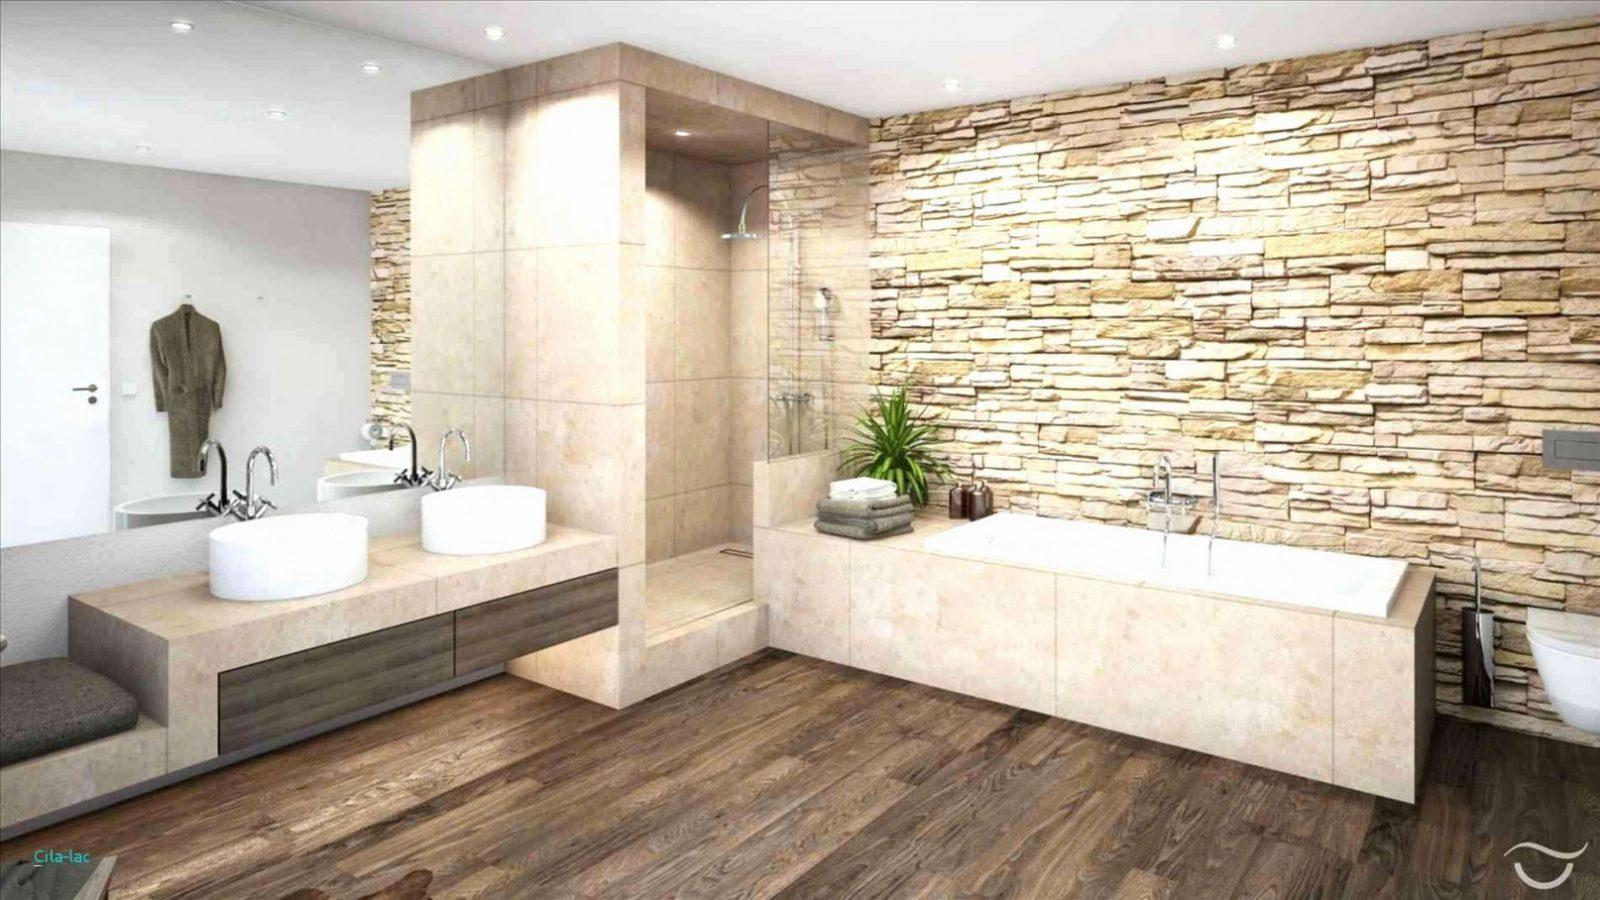 Gestaltung Badezimmer Genial Badezimmer Ideen Fliesen Design von Badezimmer Fliesen Design Ideen Photo